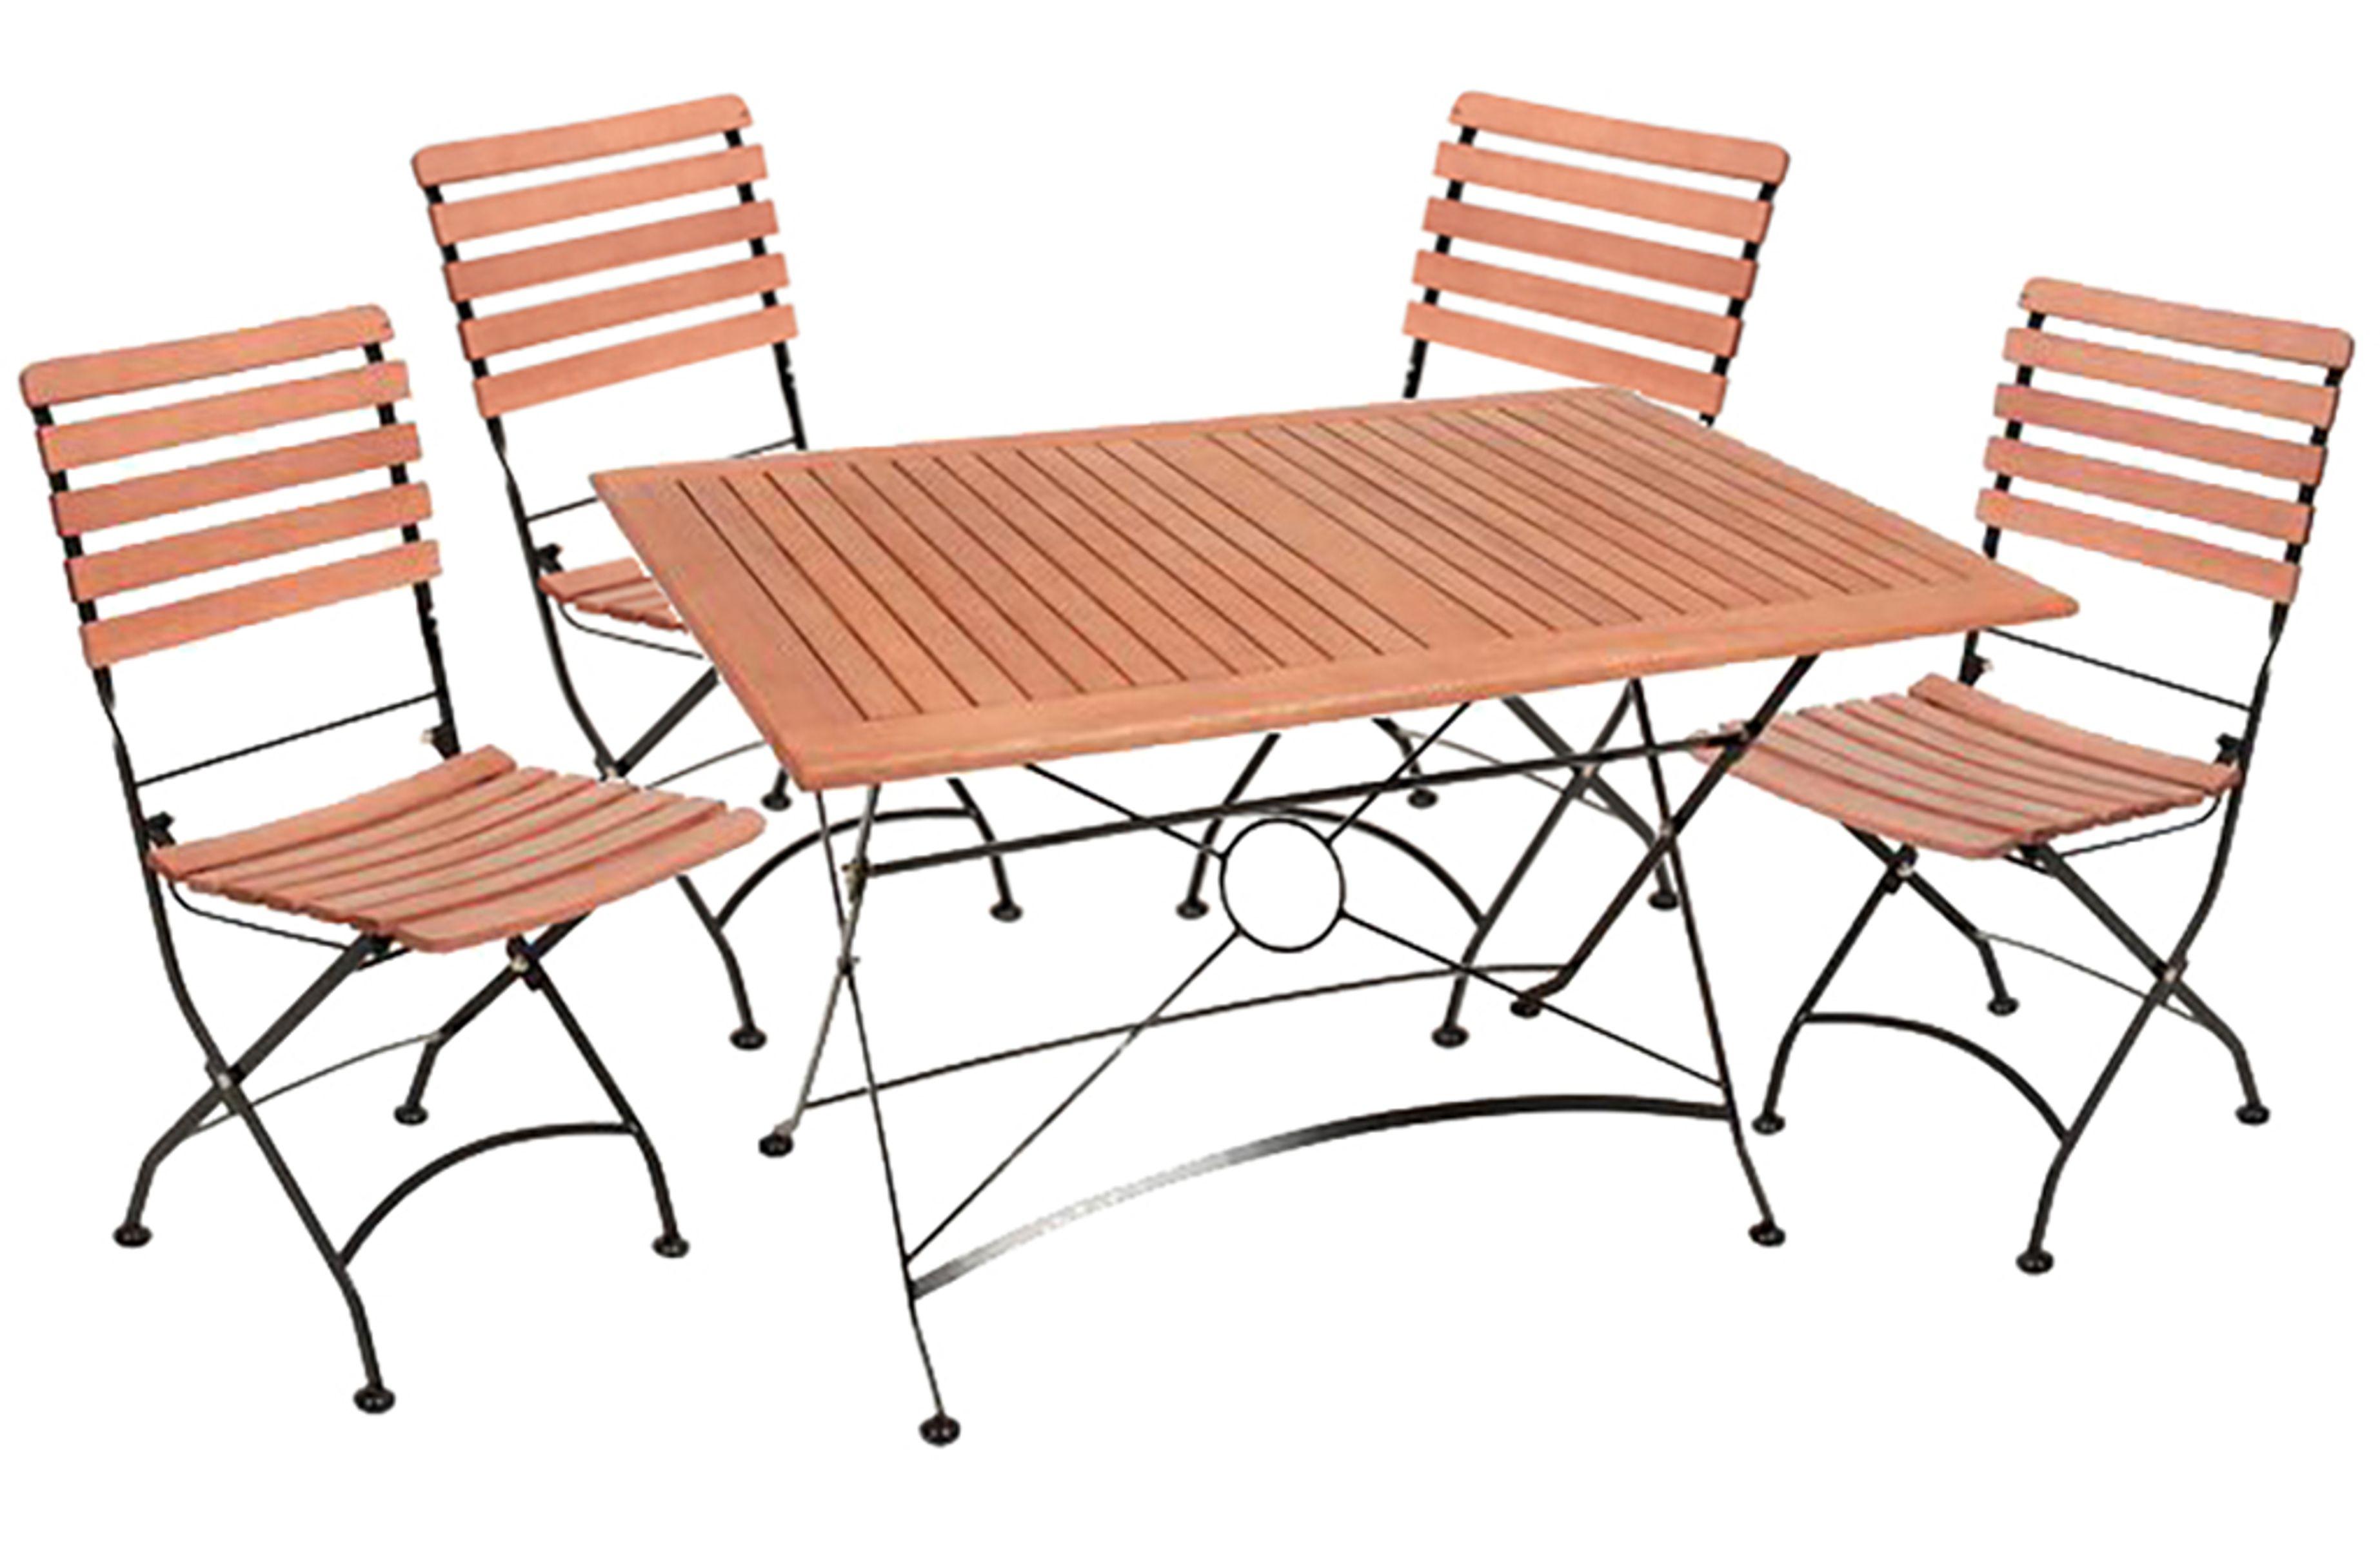 5 tlg gartengarnitur sitzgruppe sitzecke gartenm bel stuhl tisch garten balkon garten. Black Bedroom Furniture Sets. Home Design Ideas